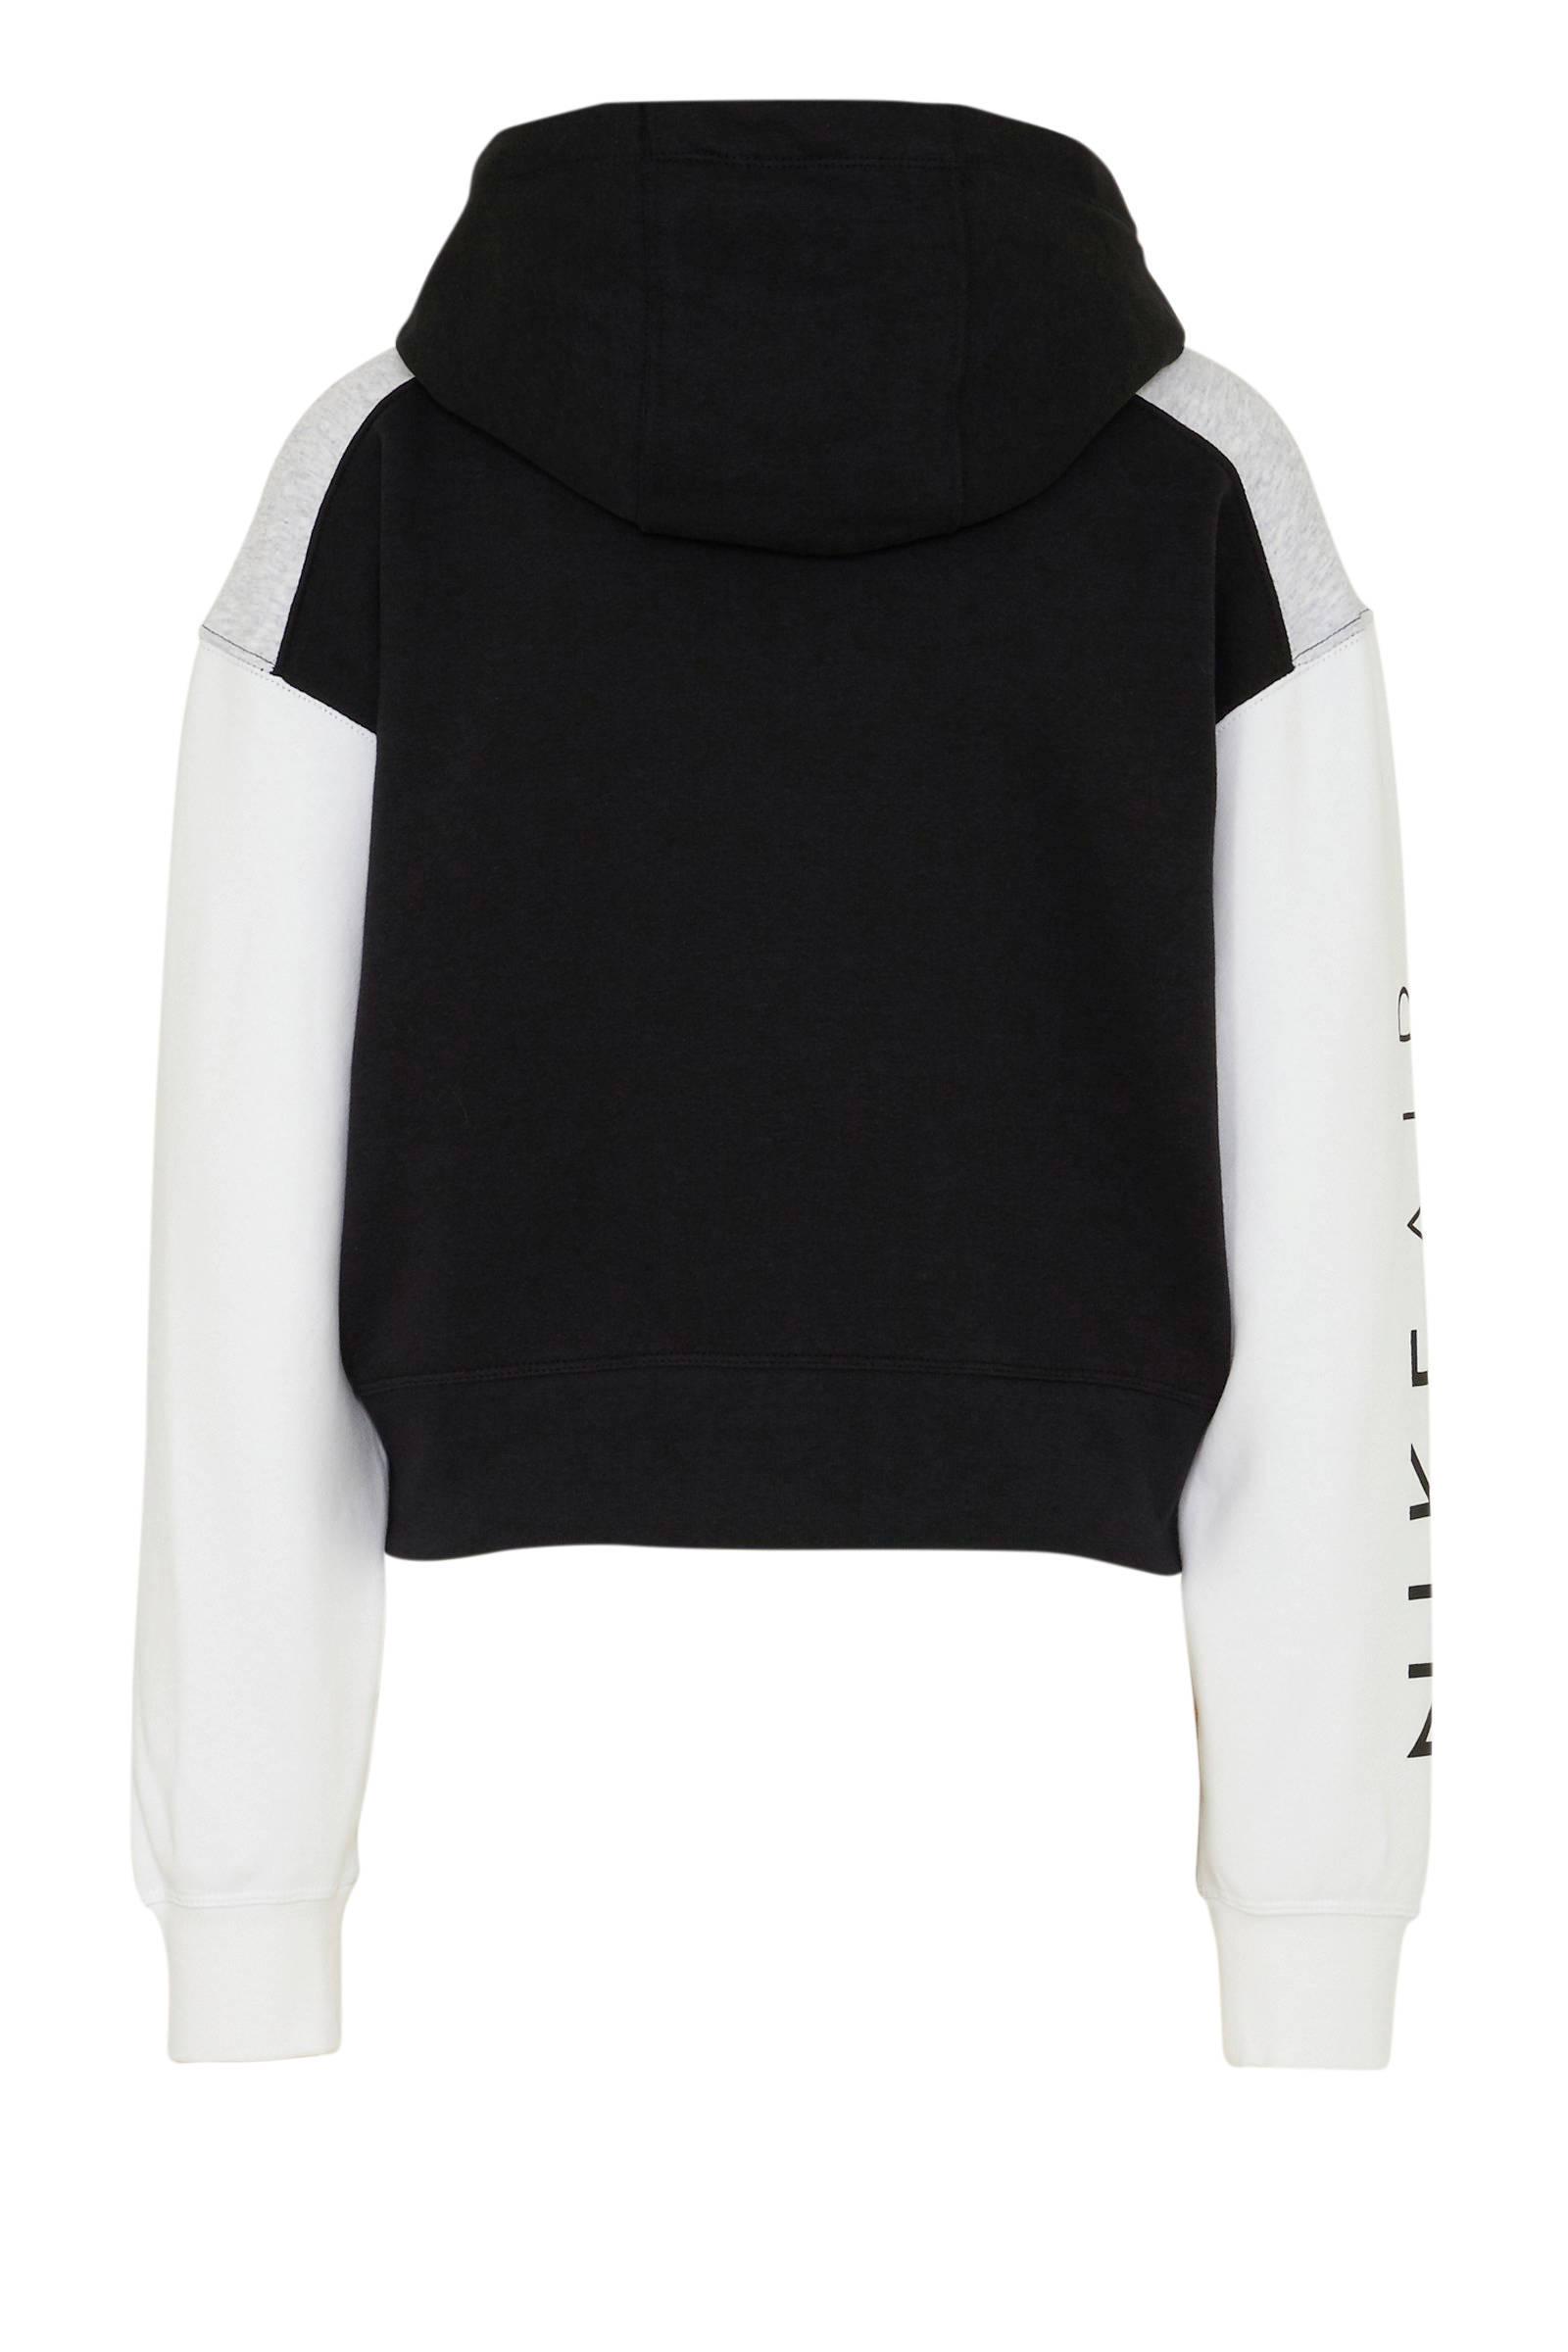 Nike Air vest zwart   wehkamp